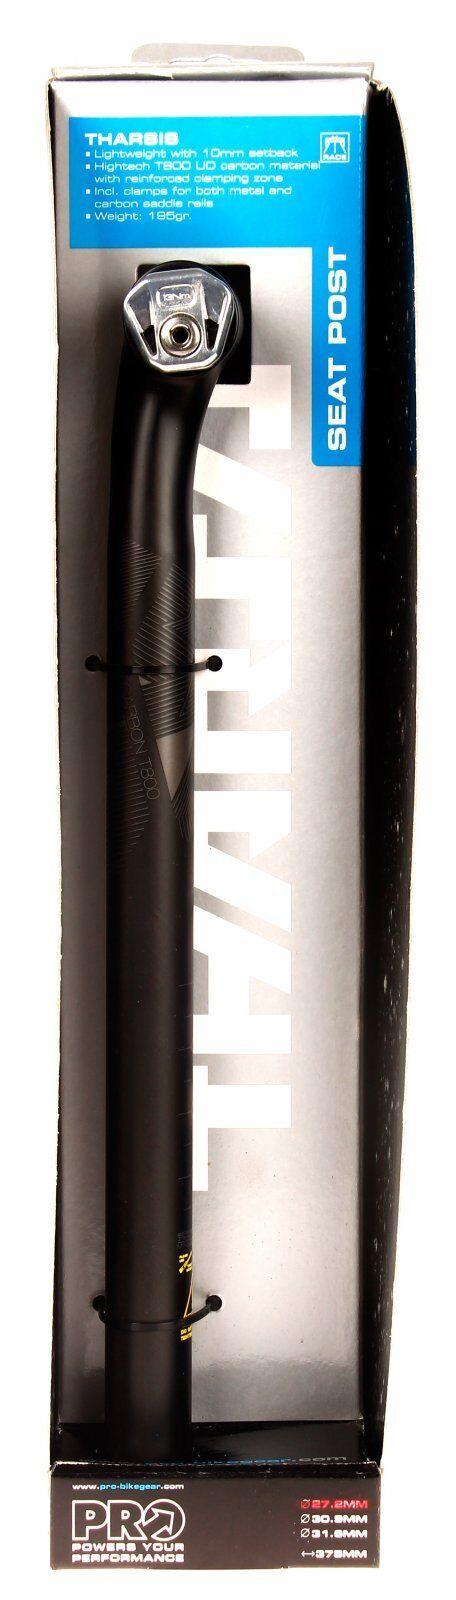 Shimano PRO Tharsis Carbon Seatpost 27.2 x375mm  NIB  high discount